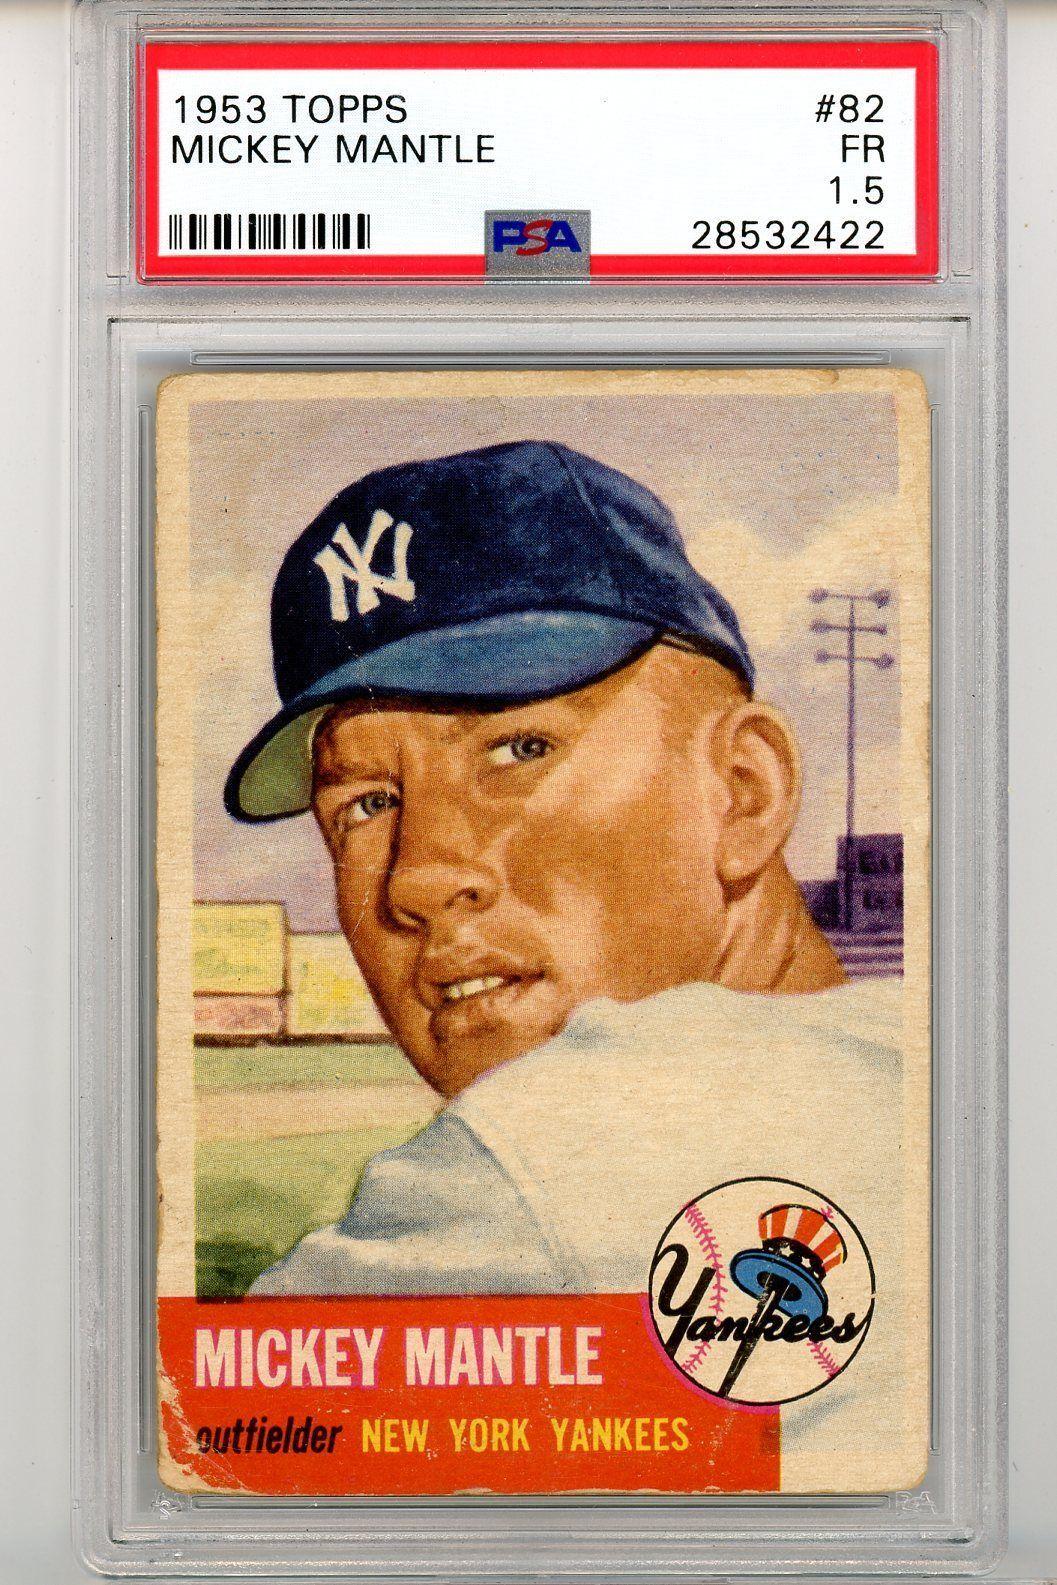 1953 topps baseball 82 mickey mantle psa 15 great eye